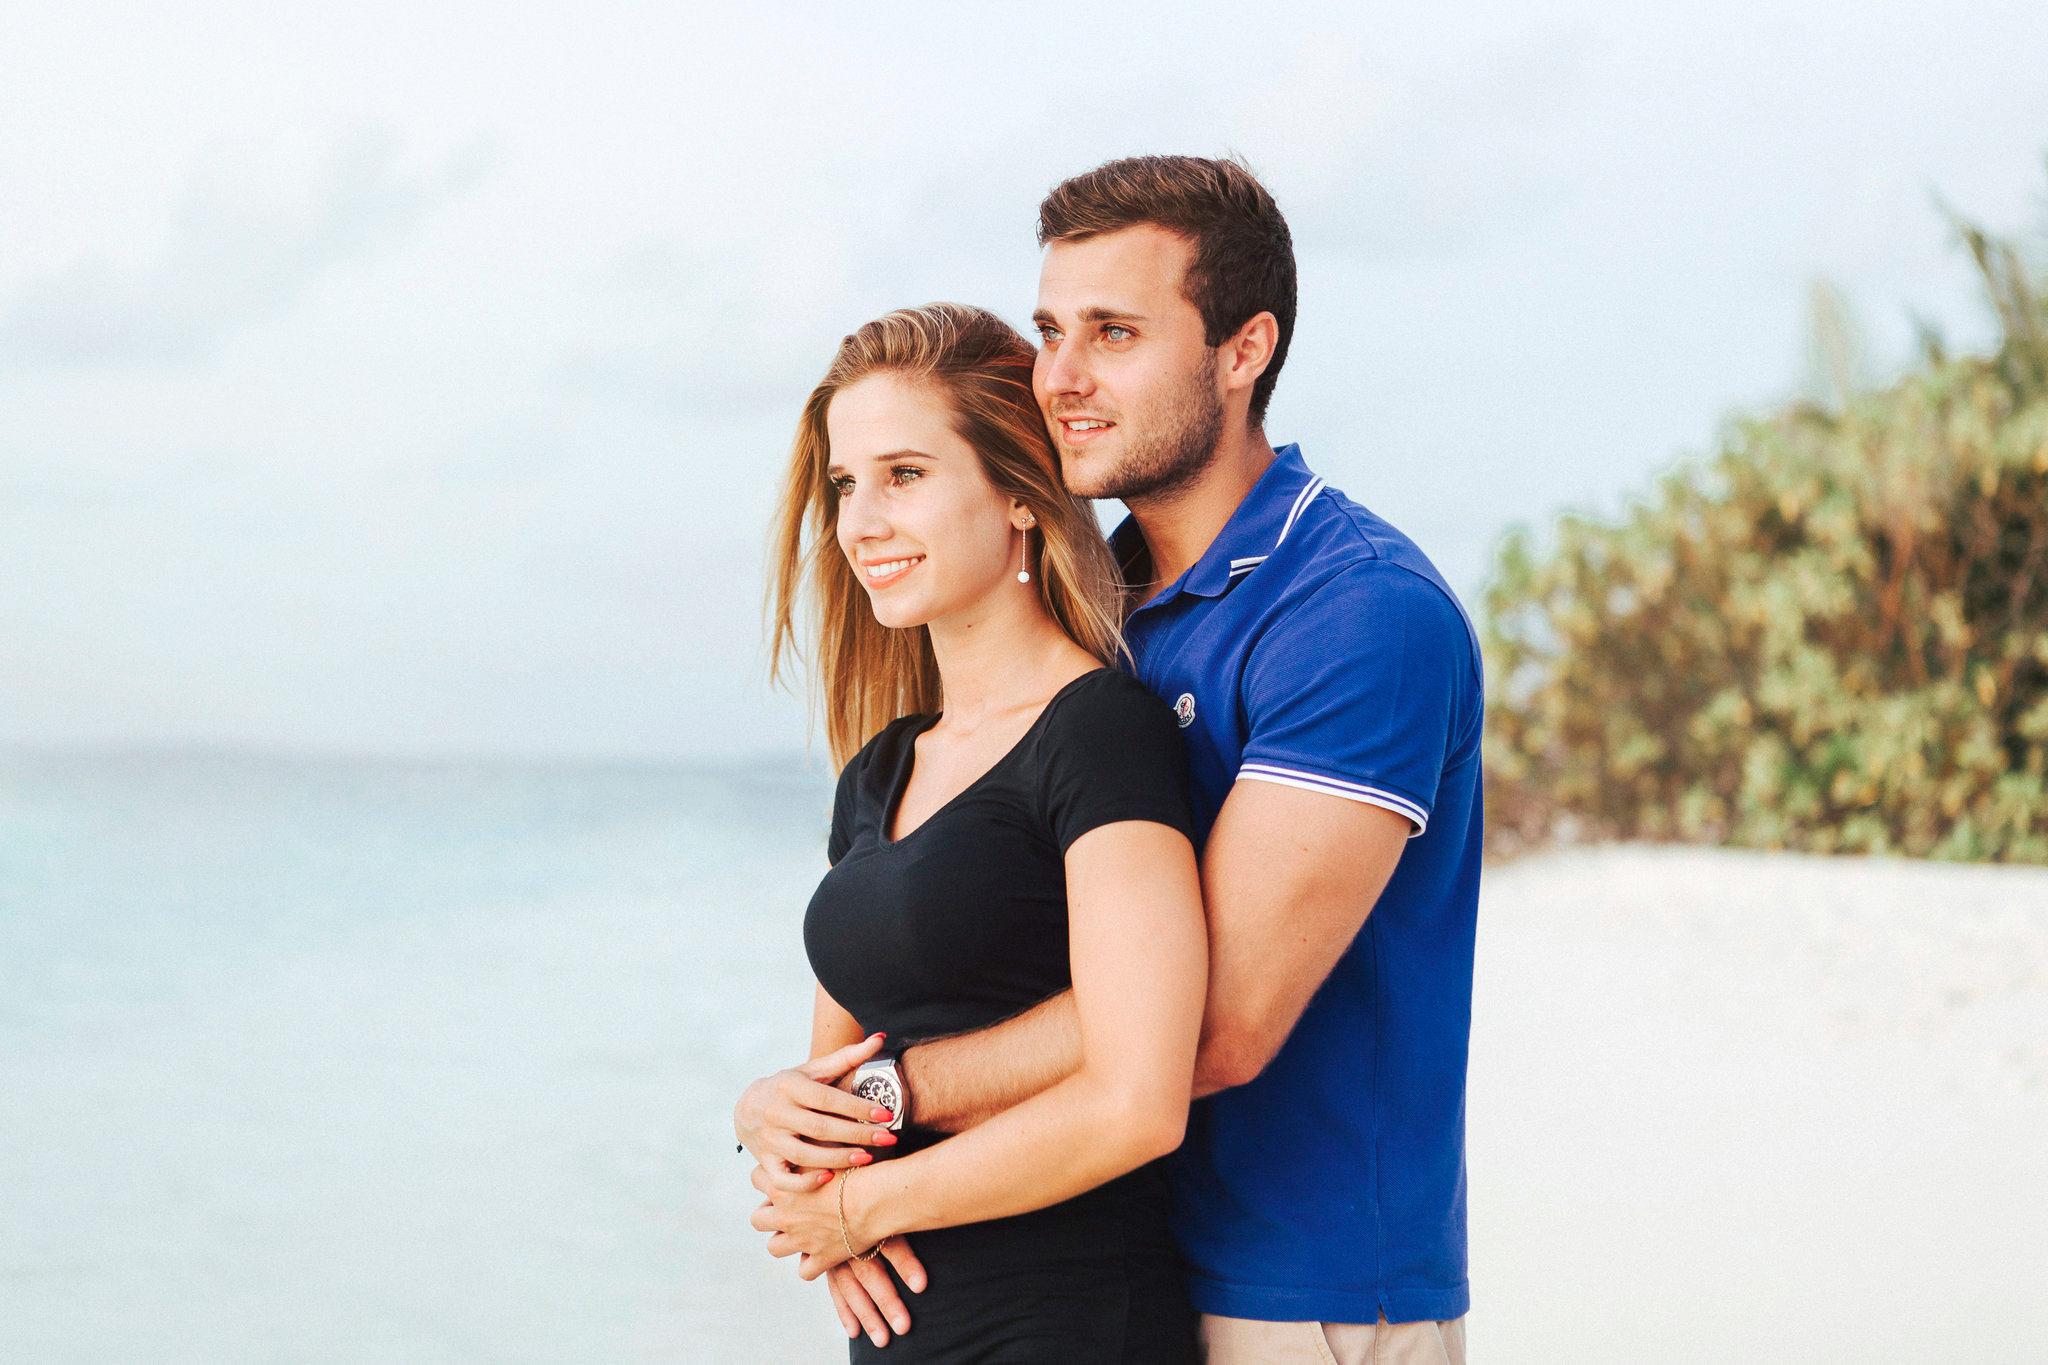 054-maldives-elopement-photographer.jpg